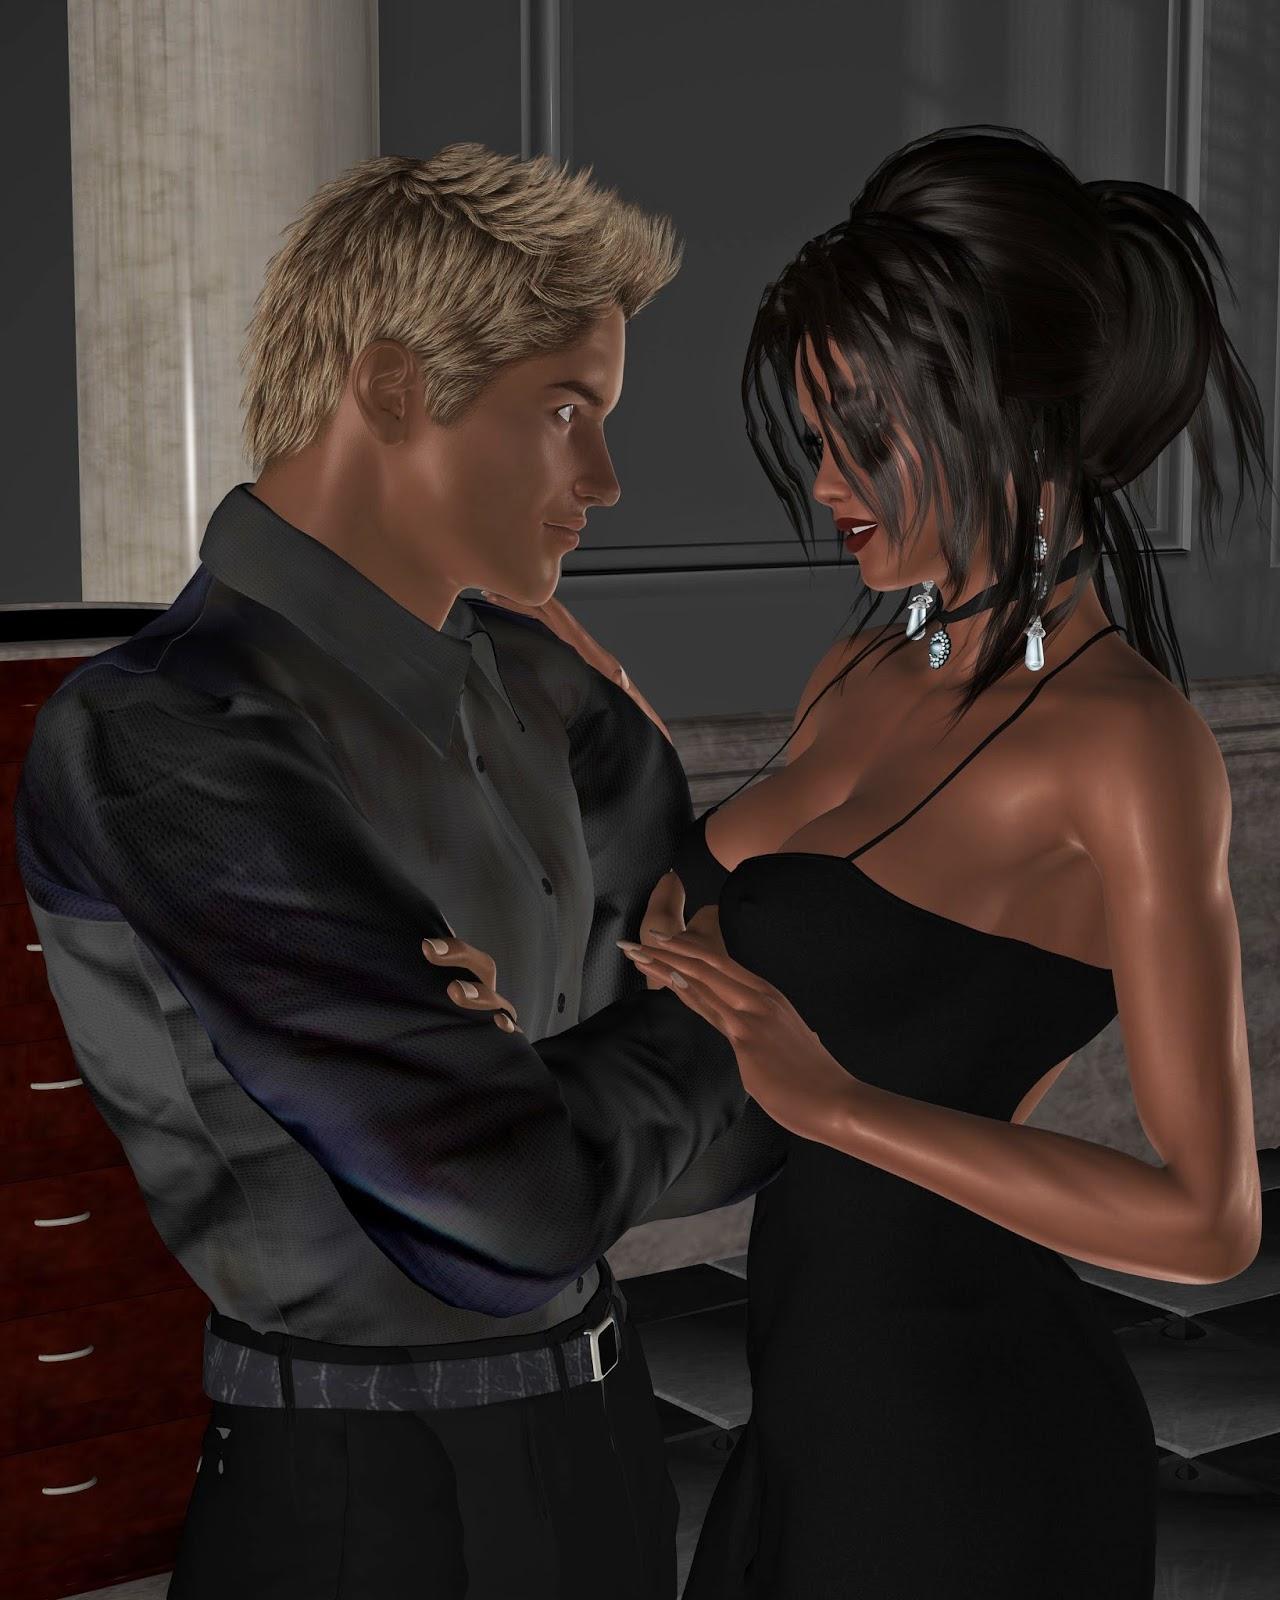 http://cosmics-3d-lara-croft.blogspot.de/p/blog-page_3.html